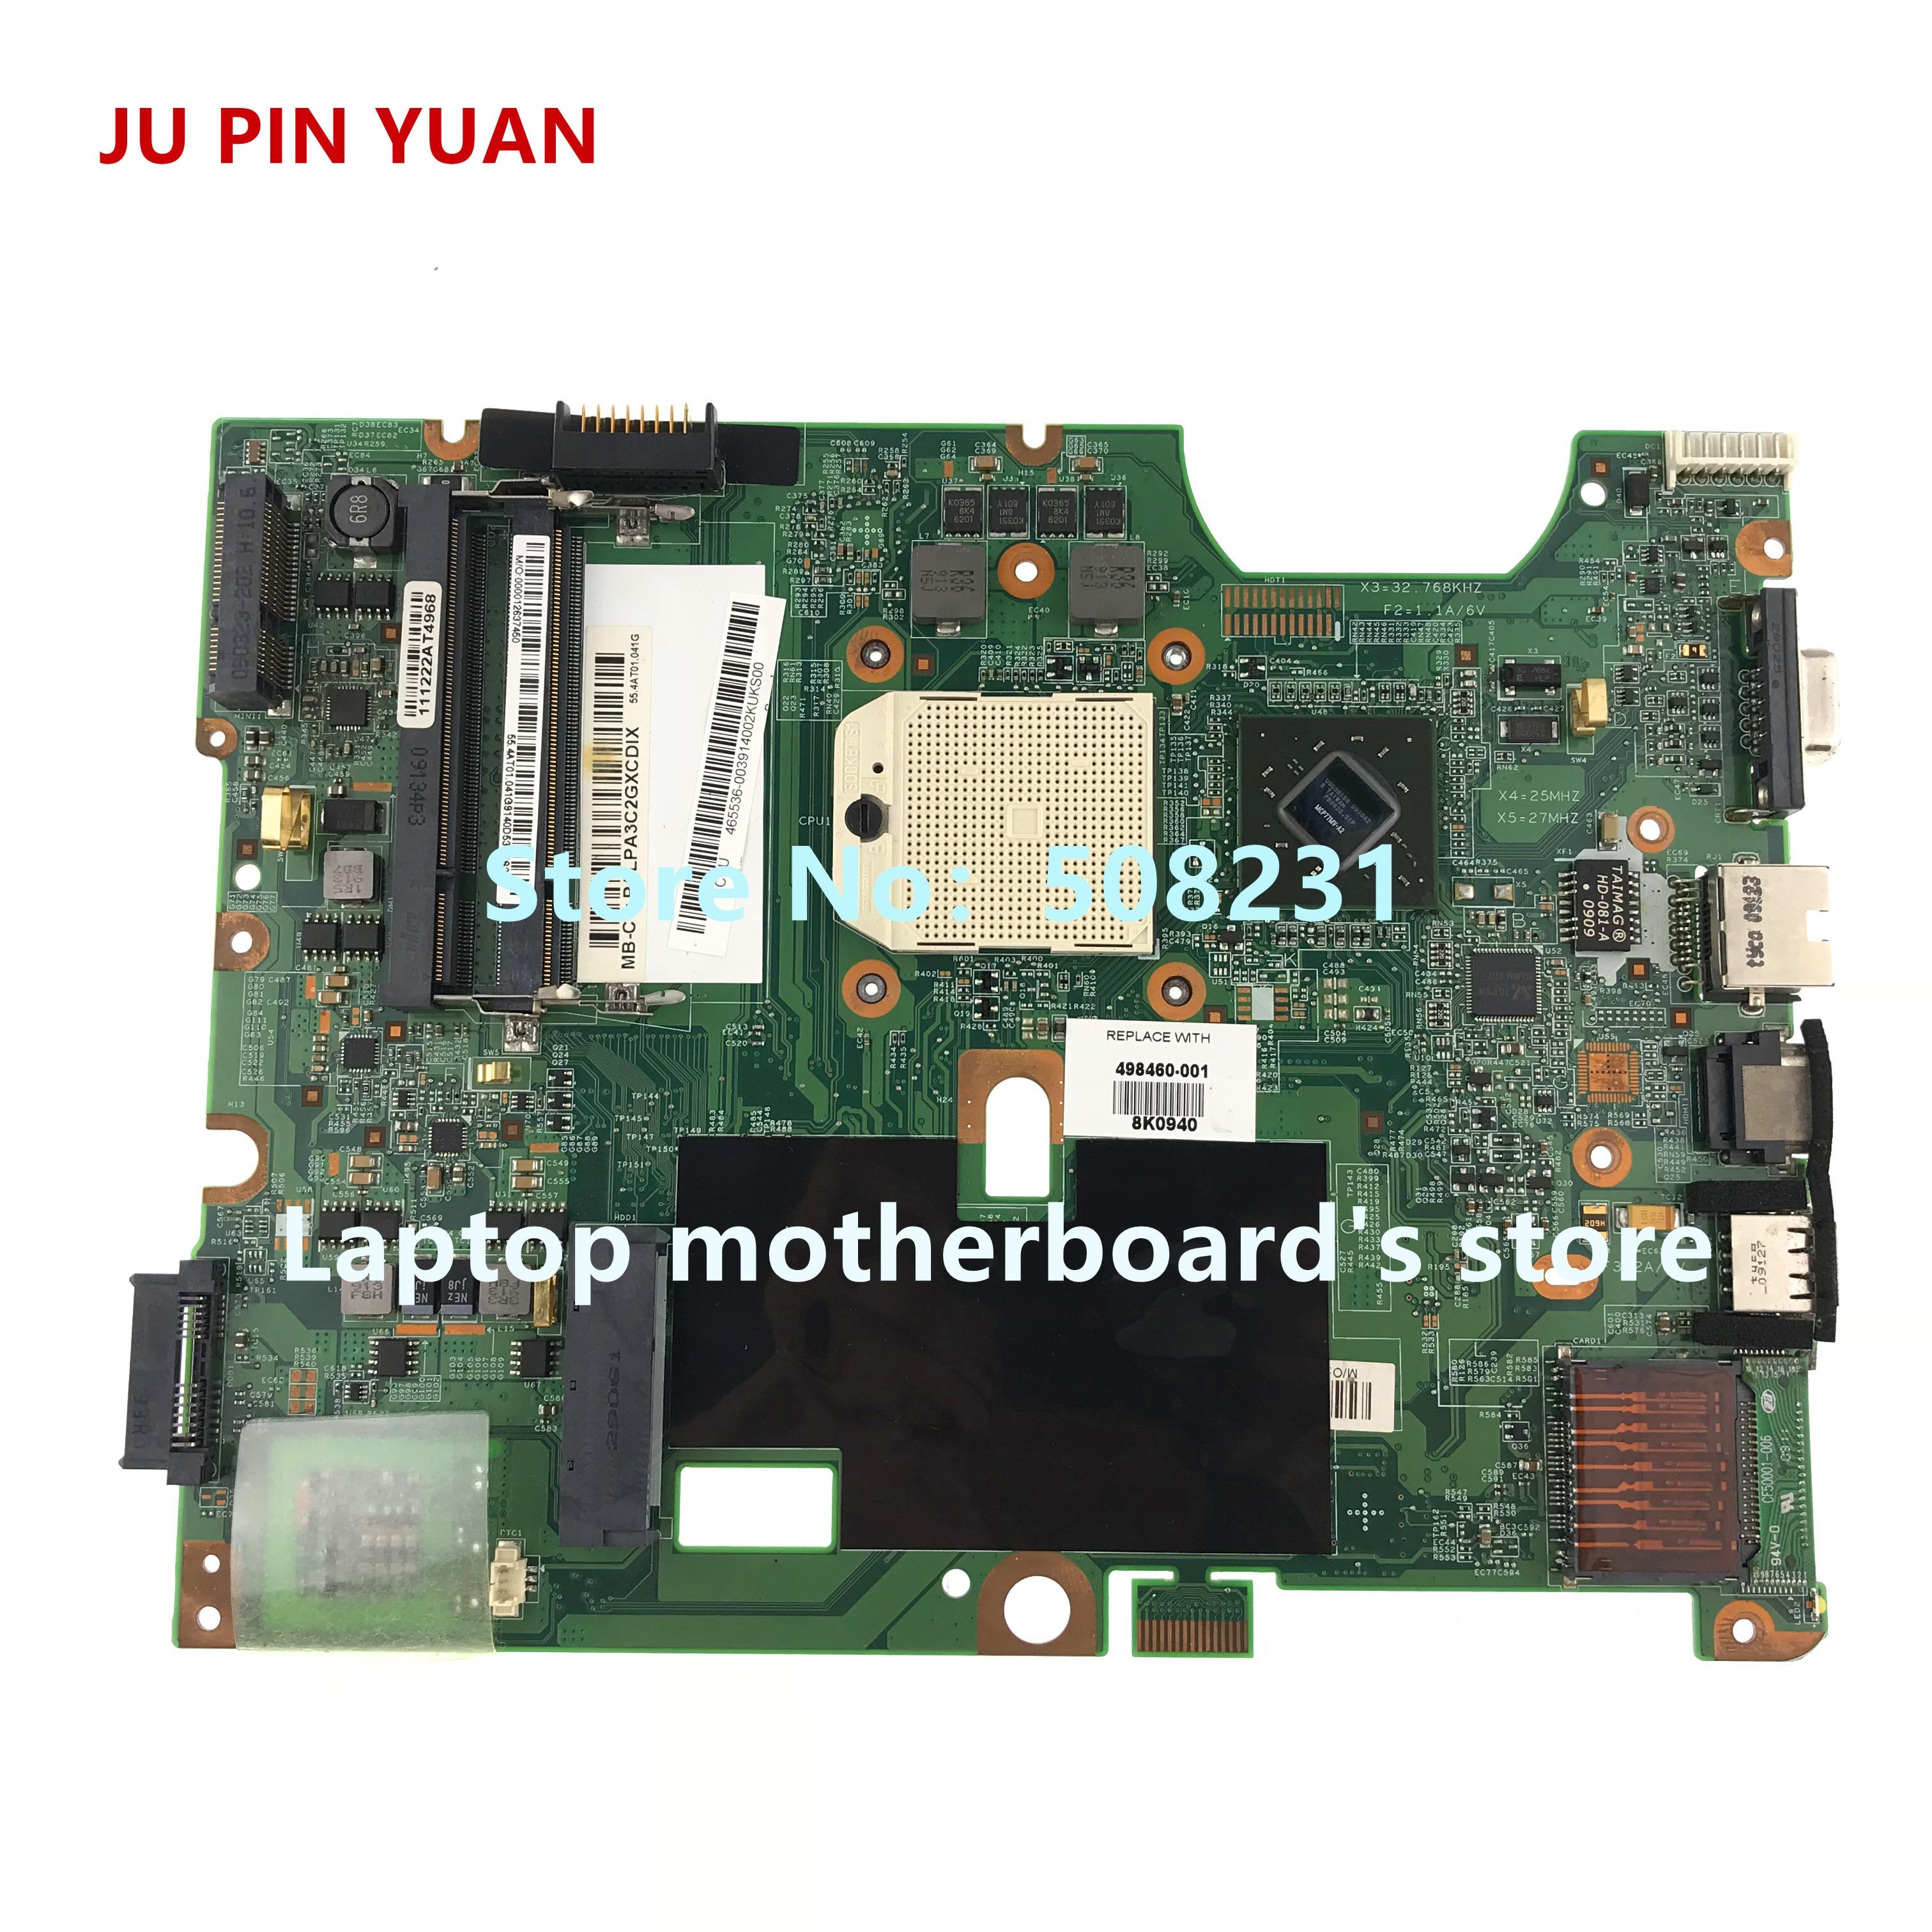 JU PIN YUAN 498460-001 48.4J103.031 Mainboard For HP Compaq CQ50 G50 CQ60 G60 Series Laptop Motherboard Fully Tested